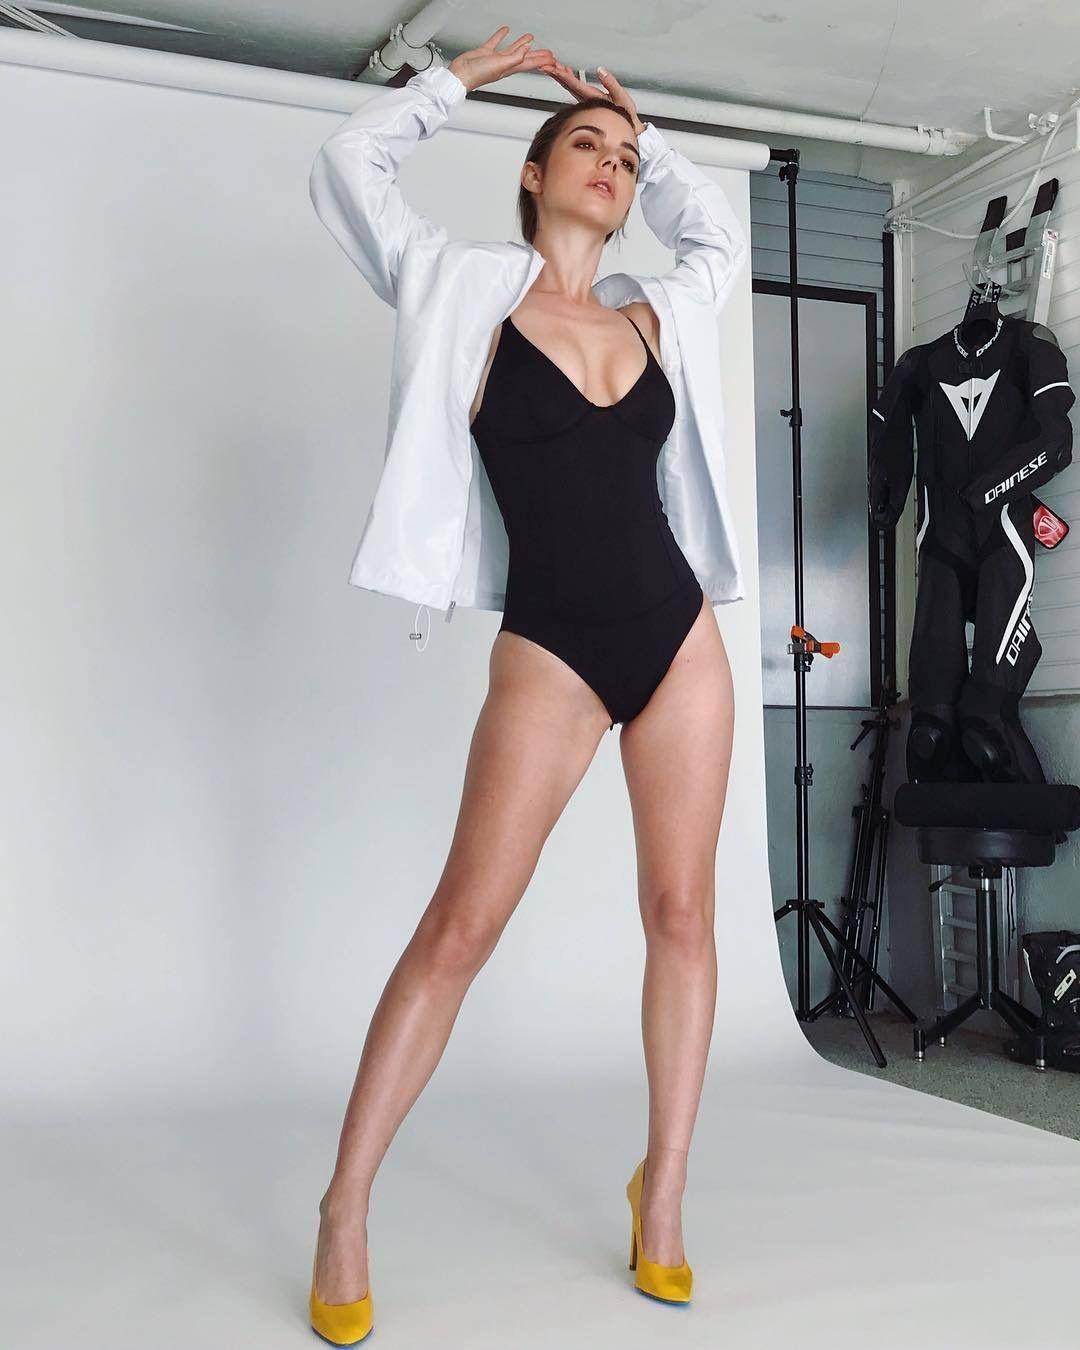 Bikini Heather Locklear nude photos 2019